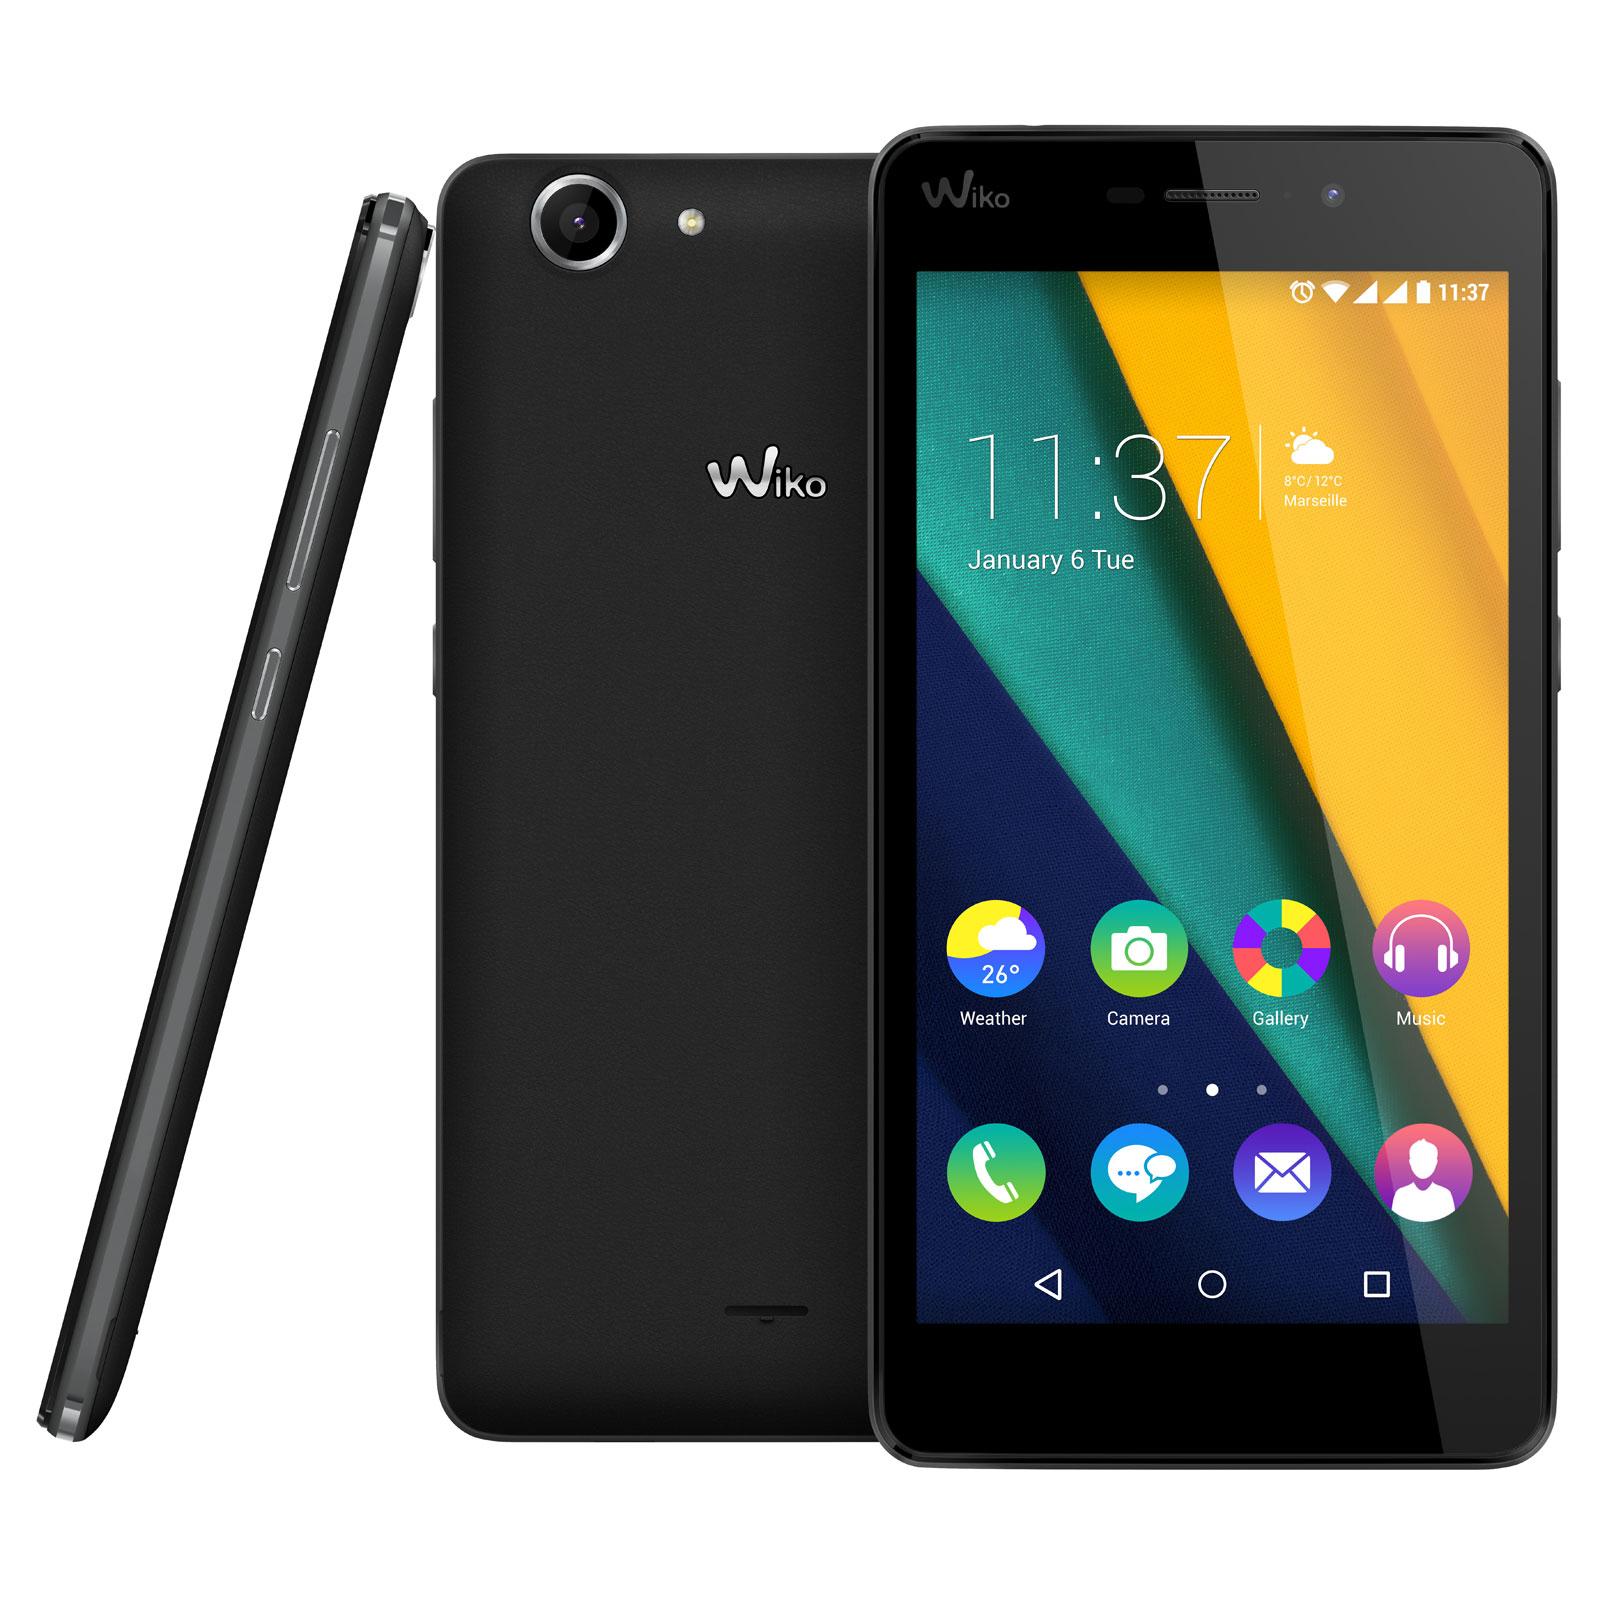 Wiko pulp fab 4g noir mobile smartphone wiko sur ldlc for Photo ecran wiko pulp